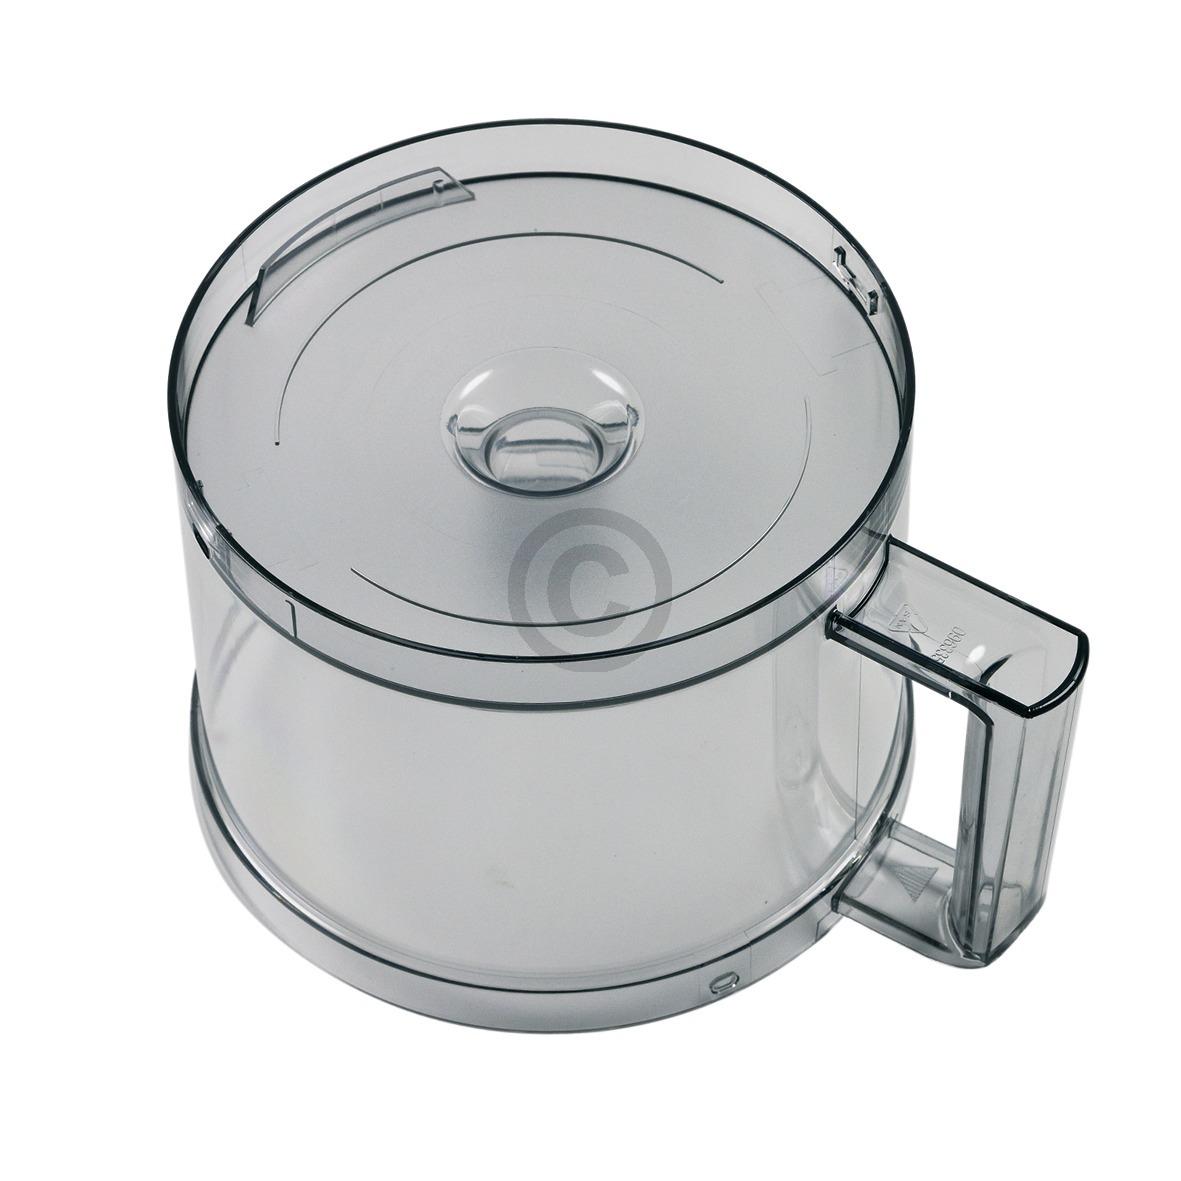 Bosch Küchenmaschine Rührschüssel 2021